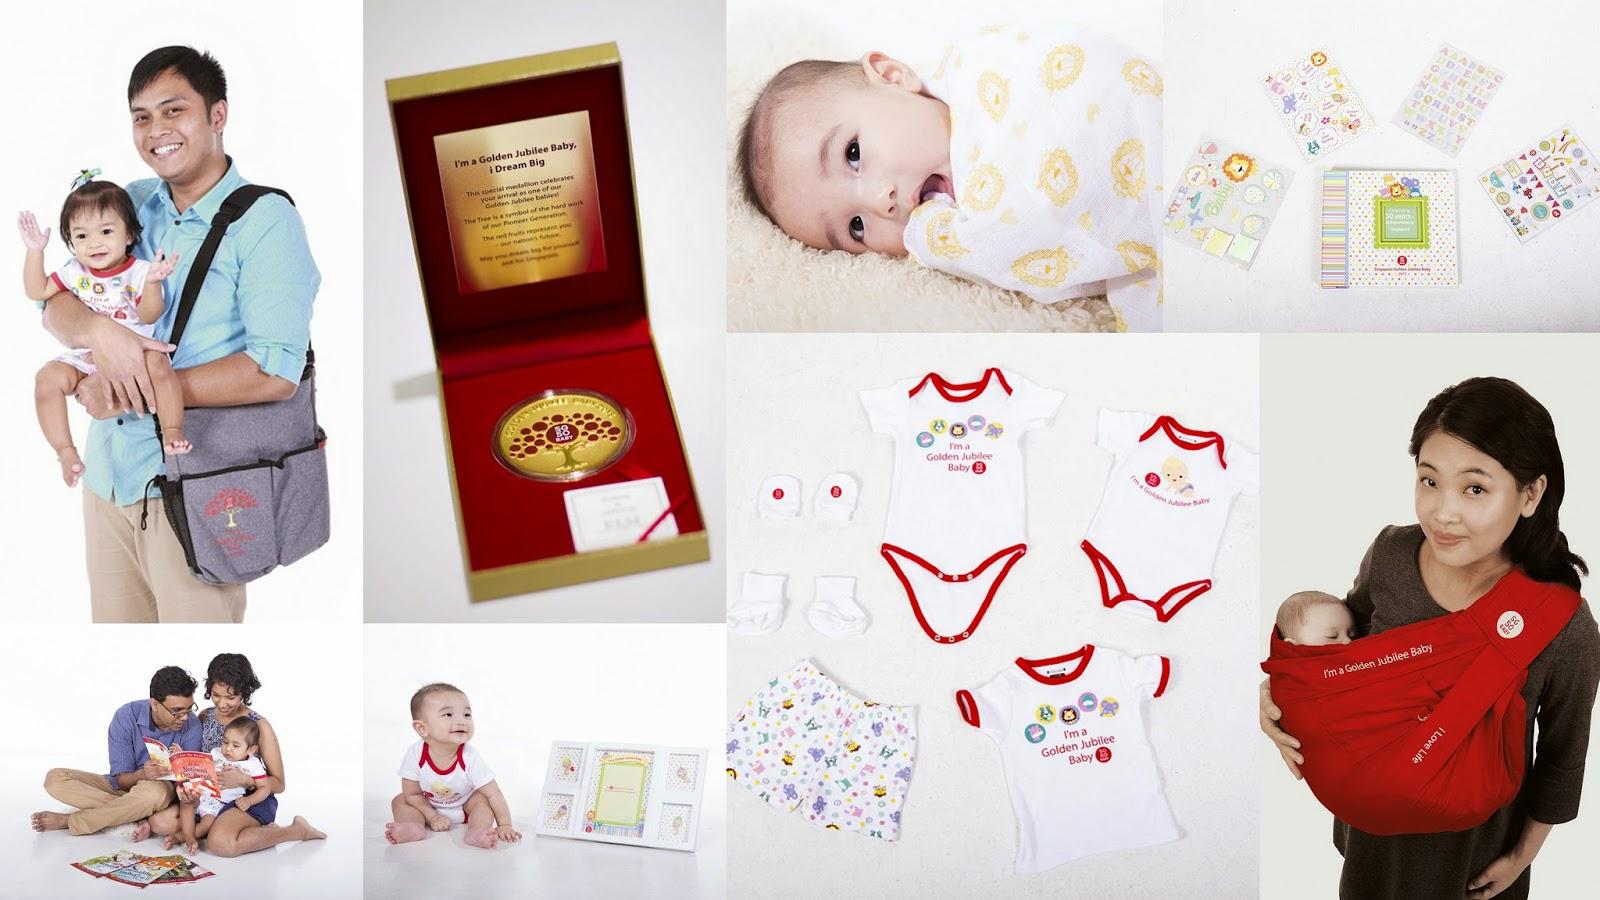 Baby Gift Registry Singapore : Msmoneysense sg jubilee baby perks